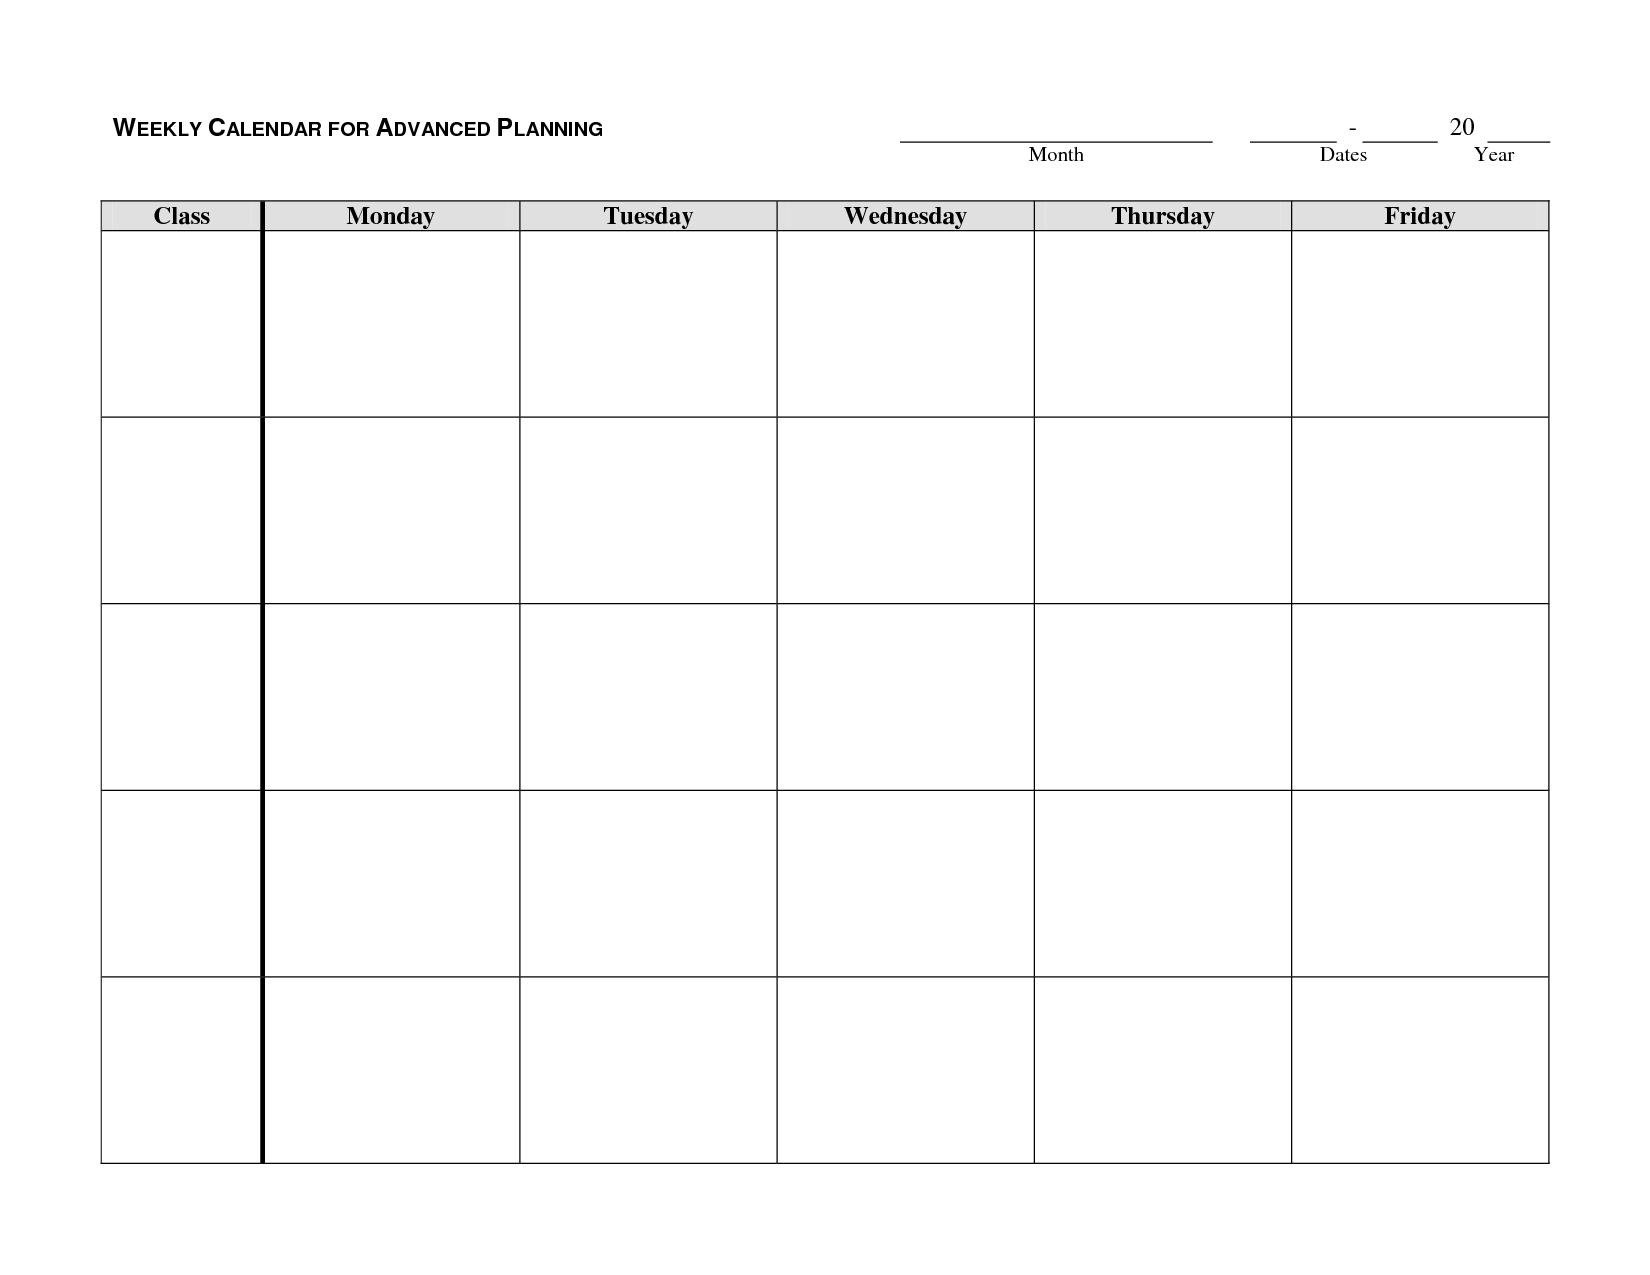 Weekly Calendar Template - Google Search   Autism/school